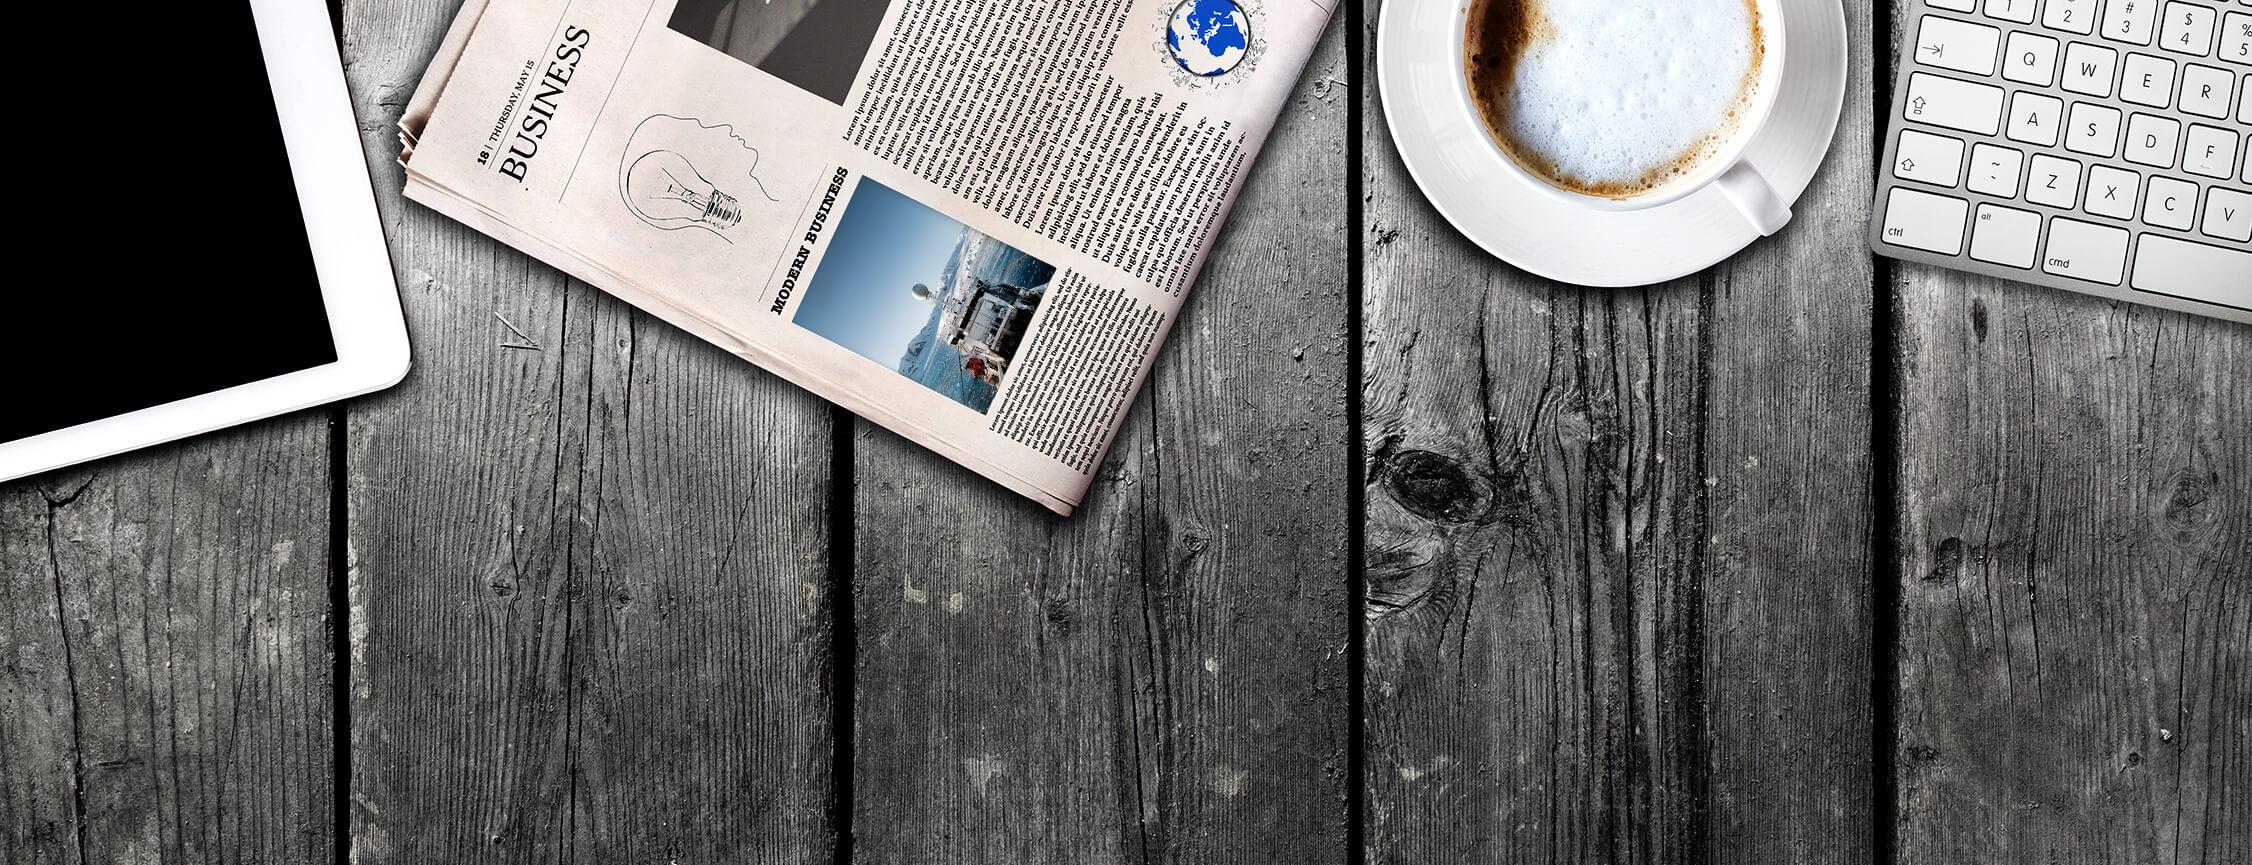 Press releases aker biomarine and qrill aqua.jpg